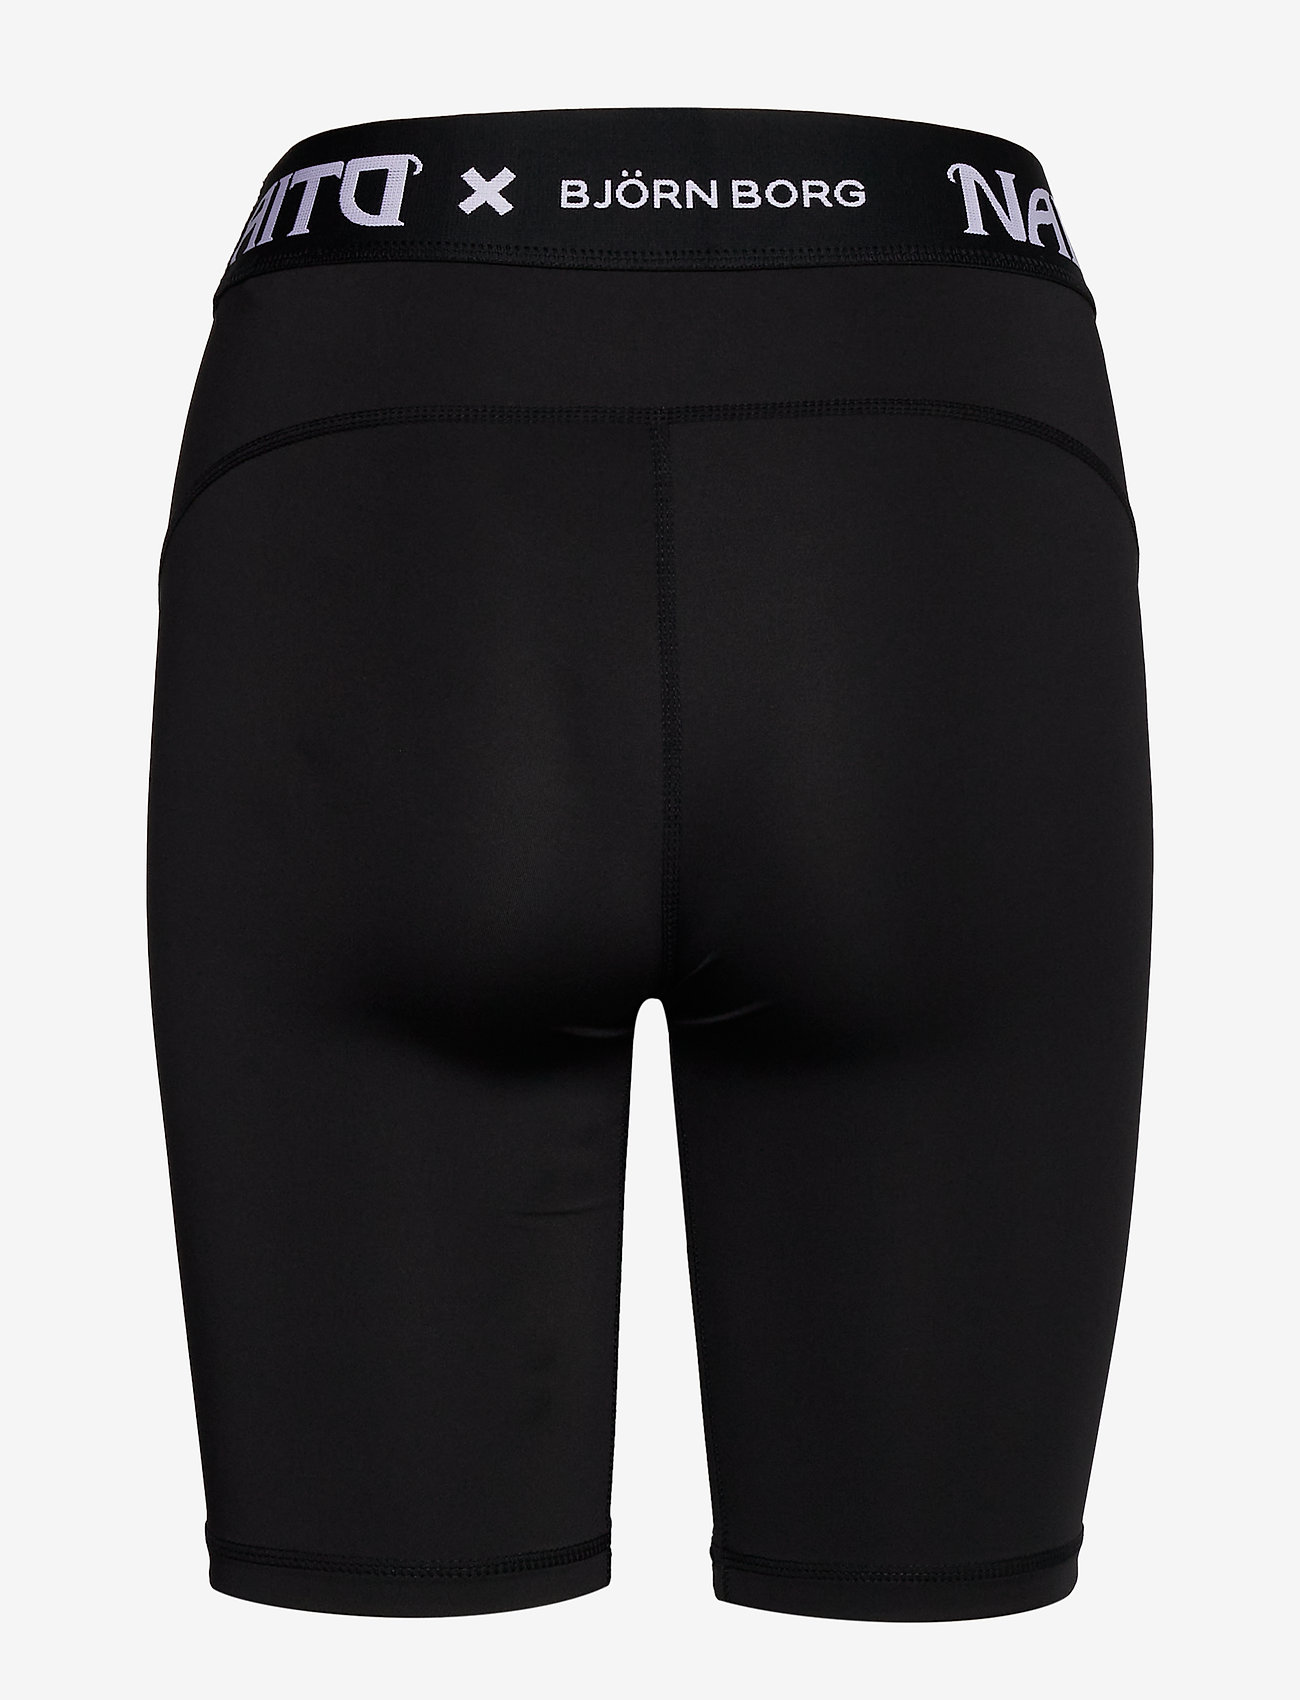 Bike Shorts Carly Carly (Naito Purple) - Björn Borg Q9GrPu